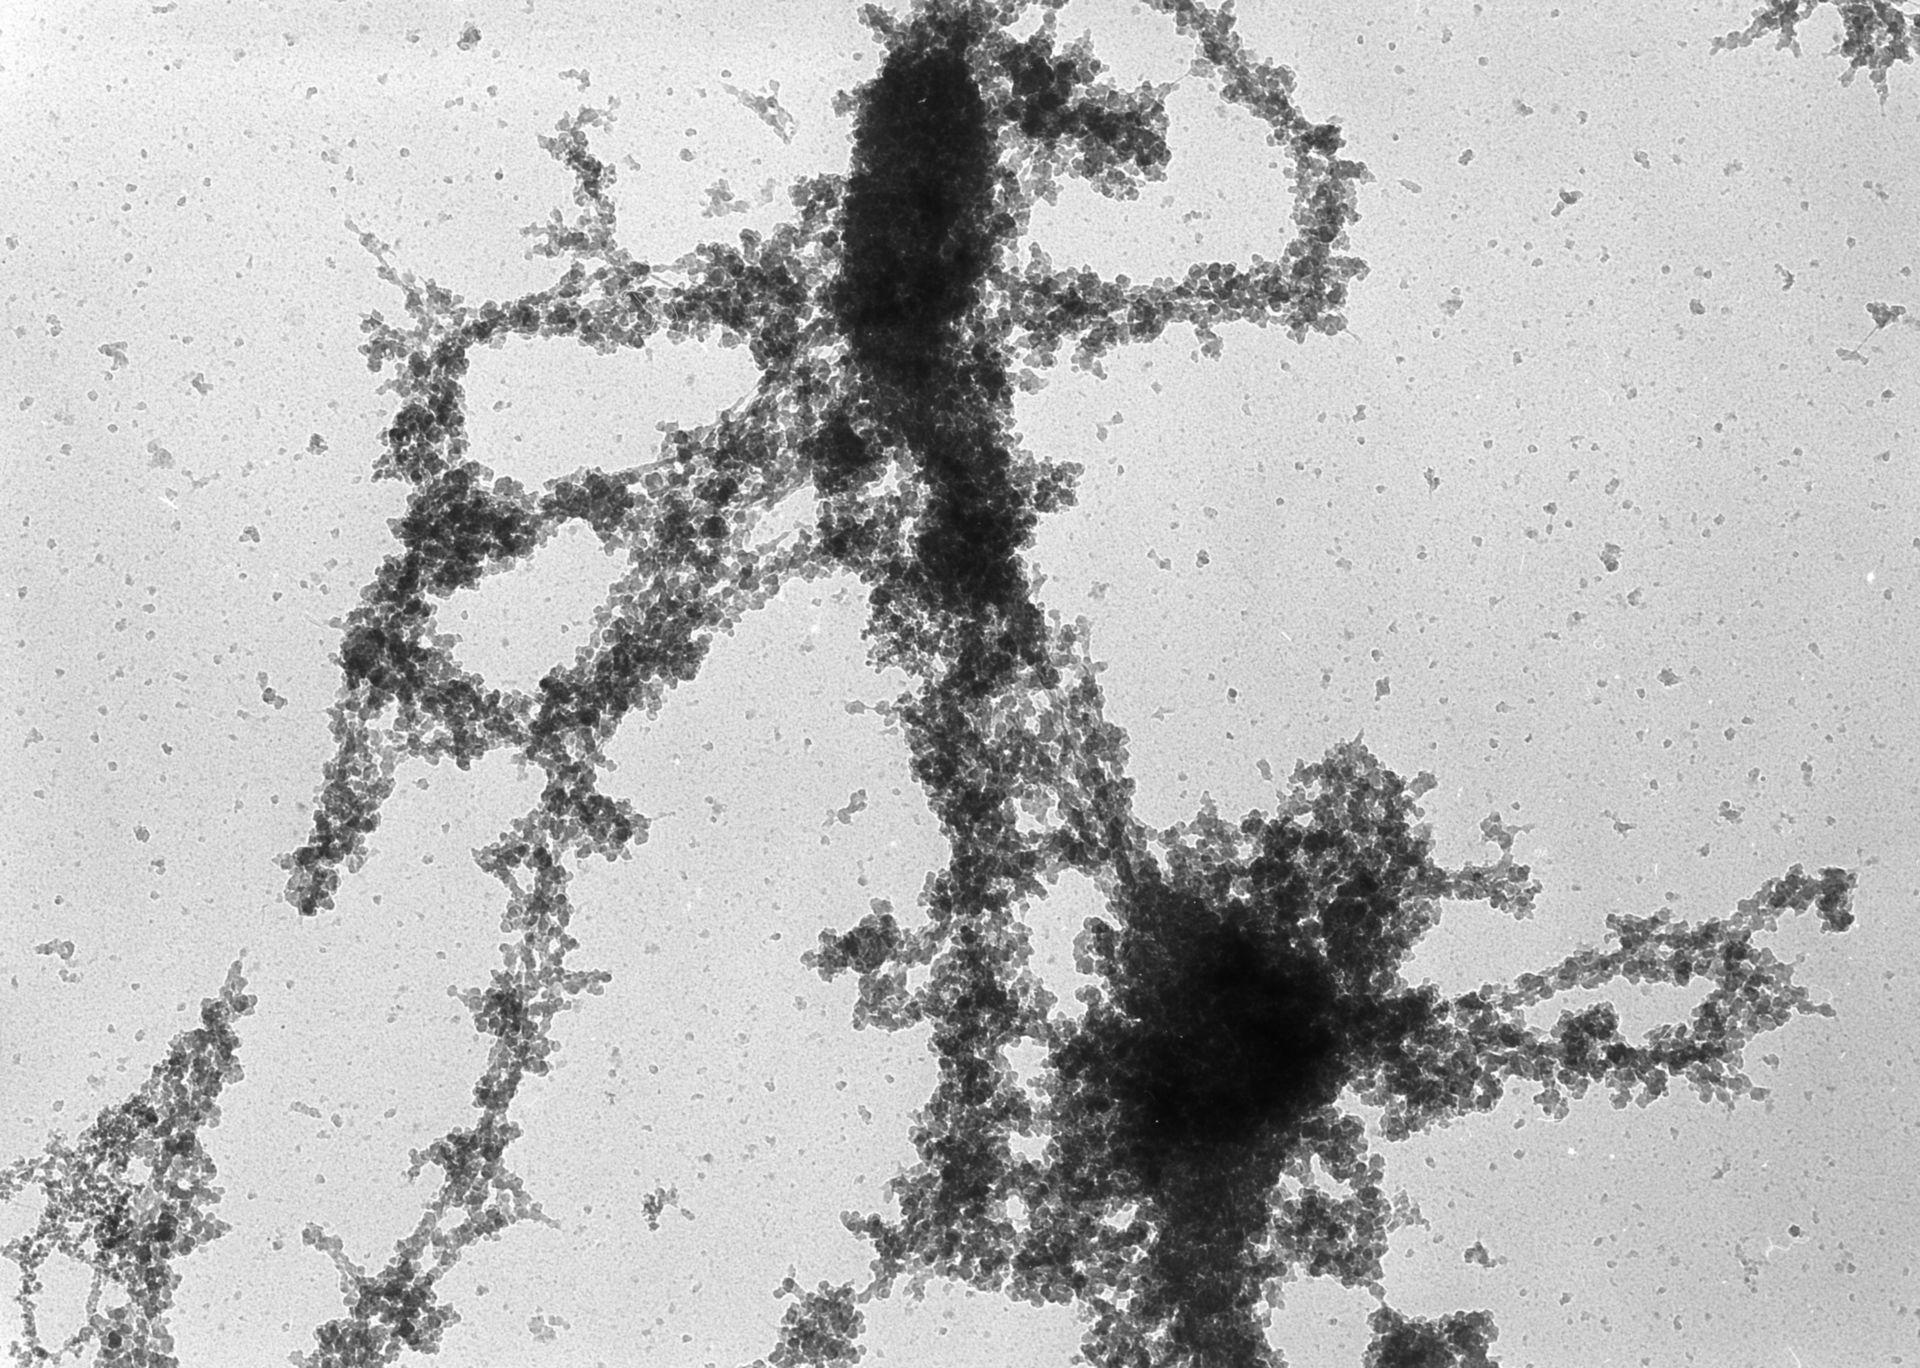 Notophthalmus viridescens (Lampbrush chromosomes) - CIL:10709